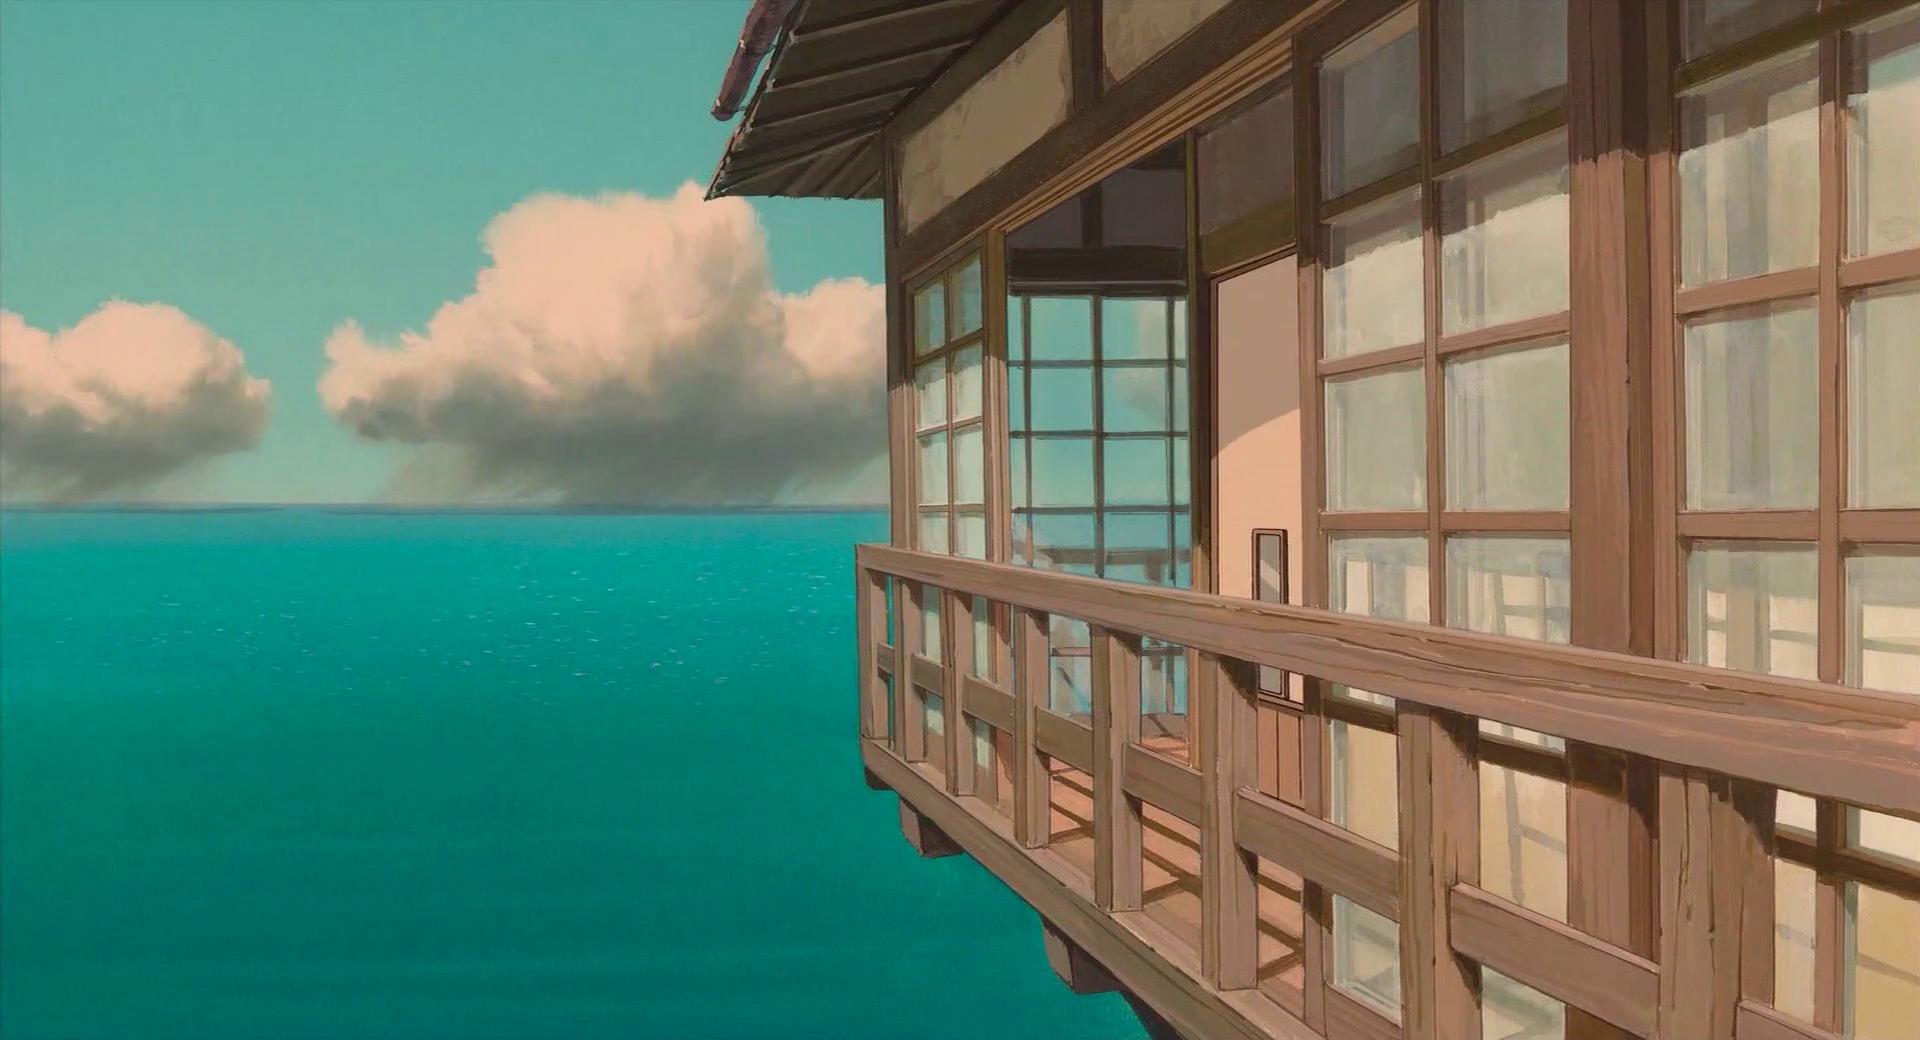 Sea House Spirited Away 3840x2160 Wallpapers